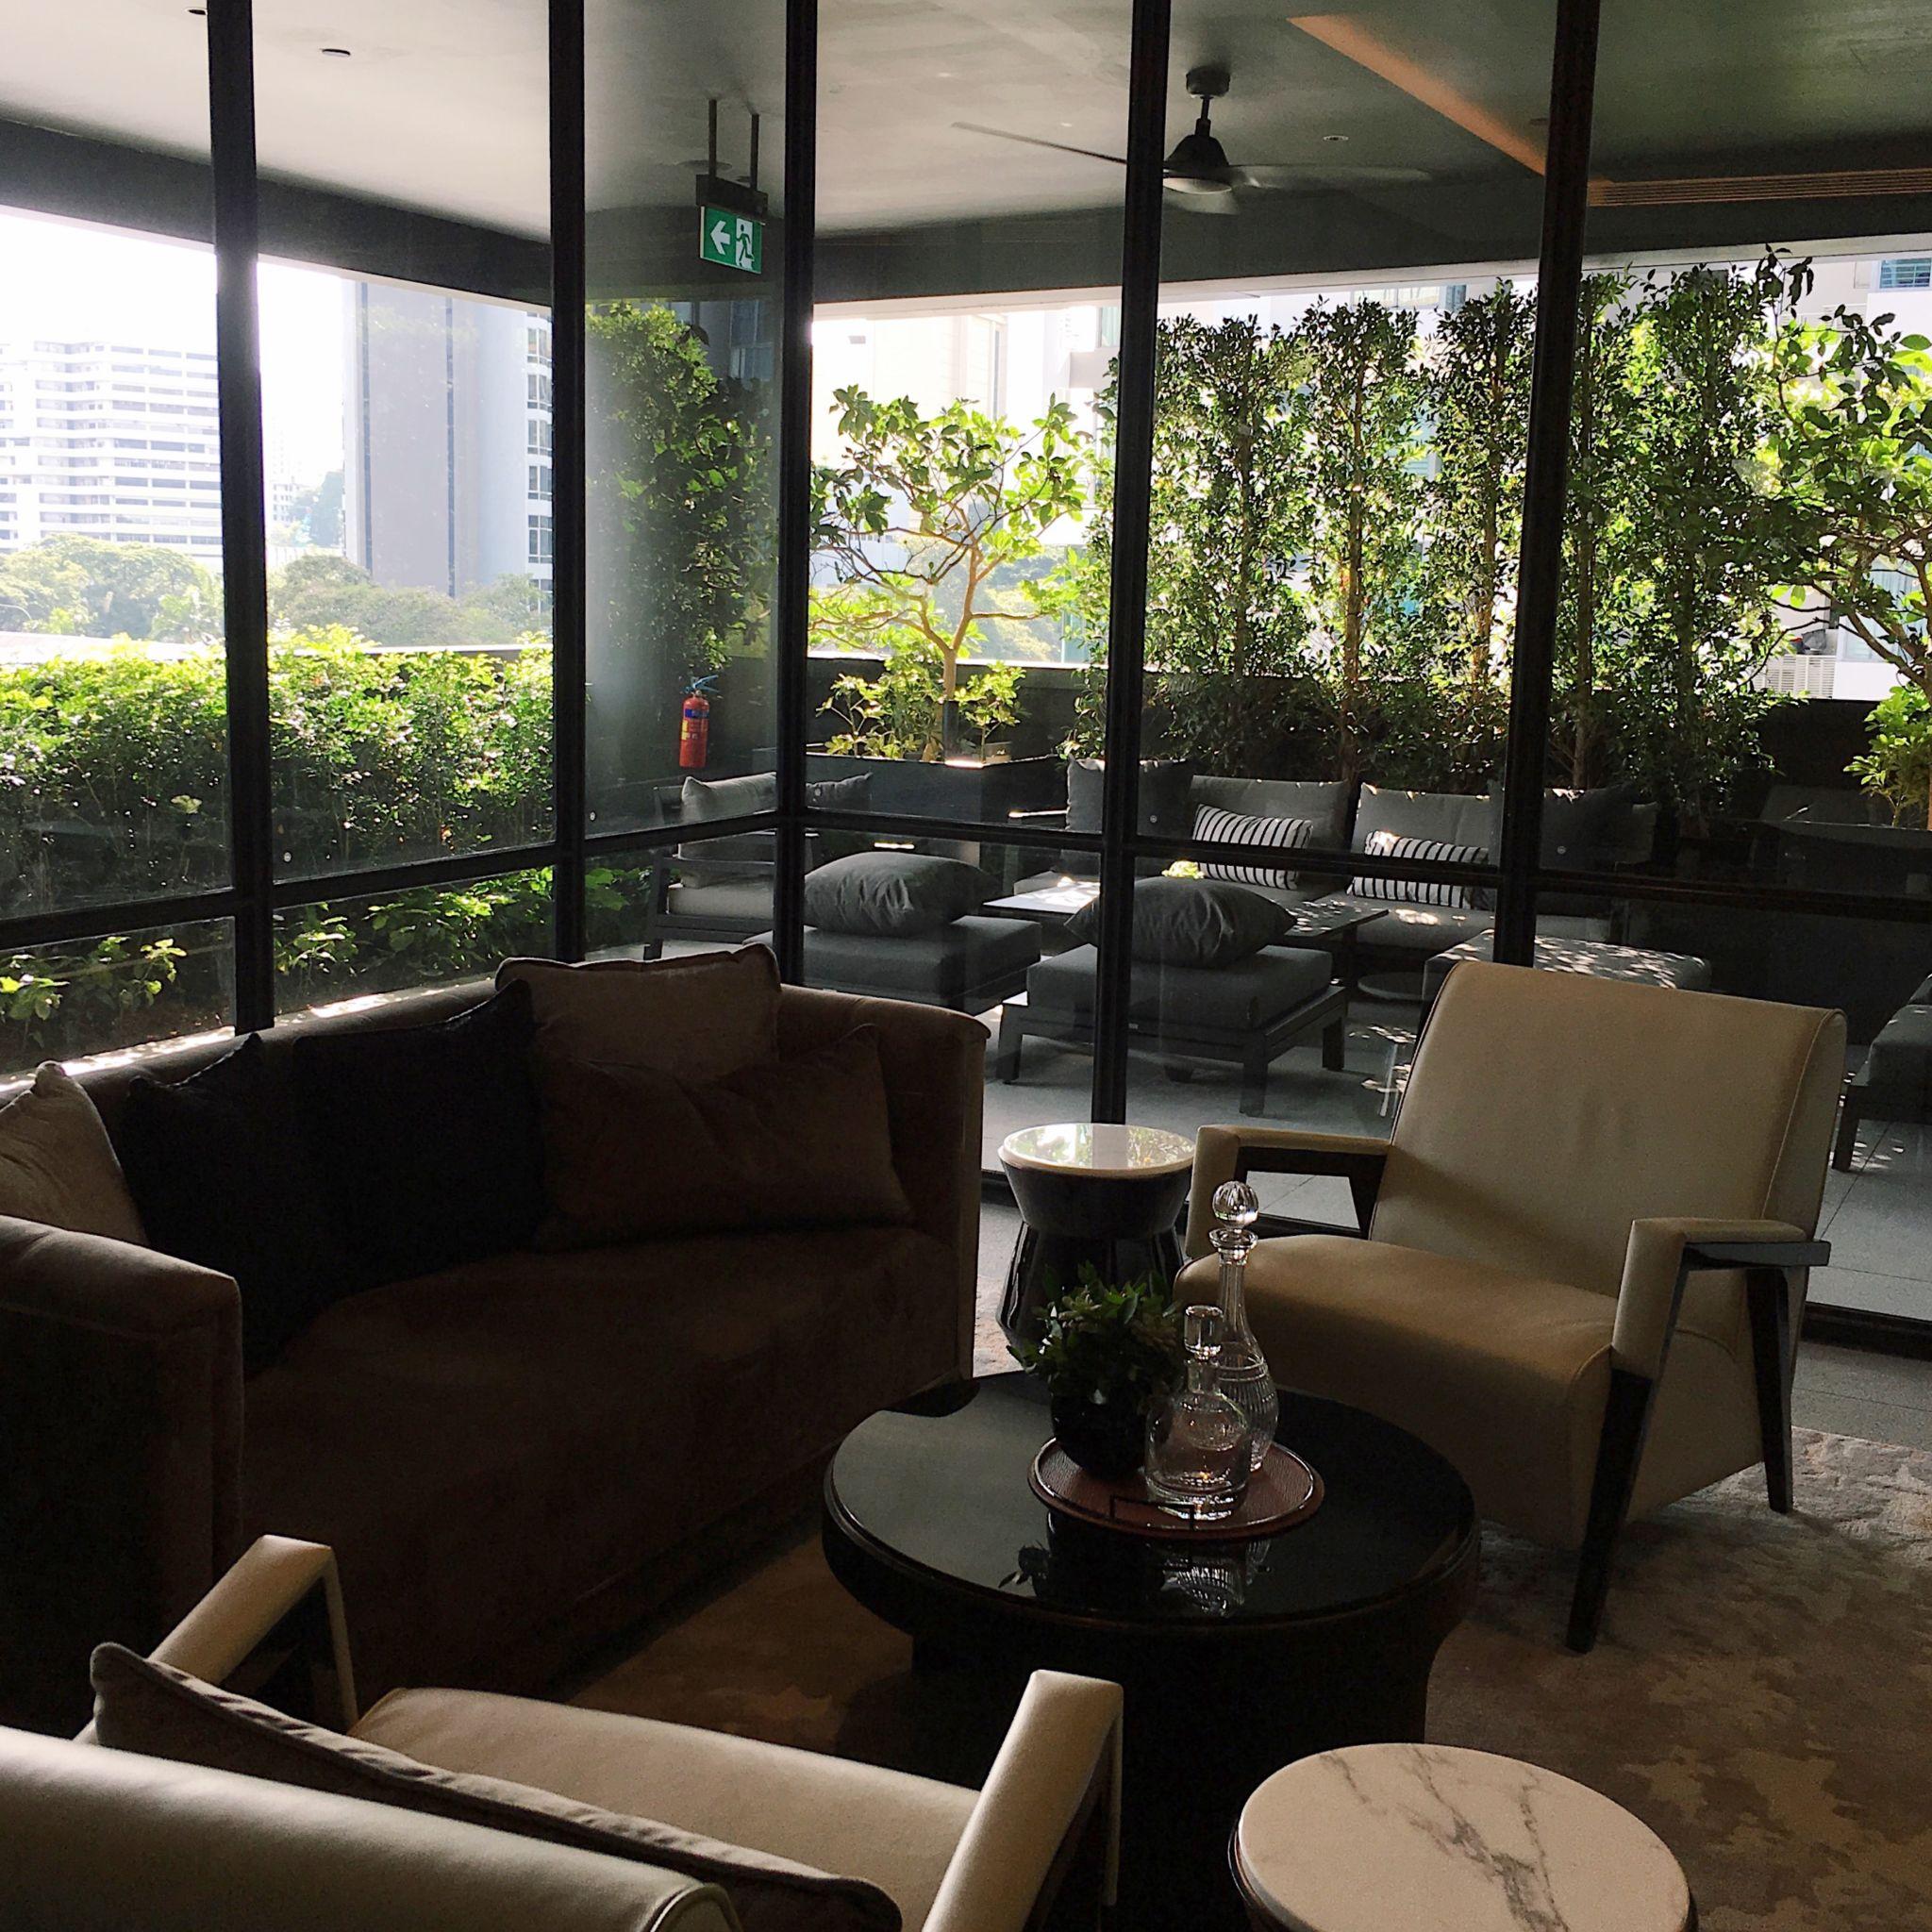 Club InterContinental Lounge - nterContinental Singapore Robertson Quay